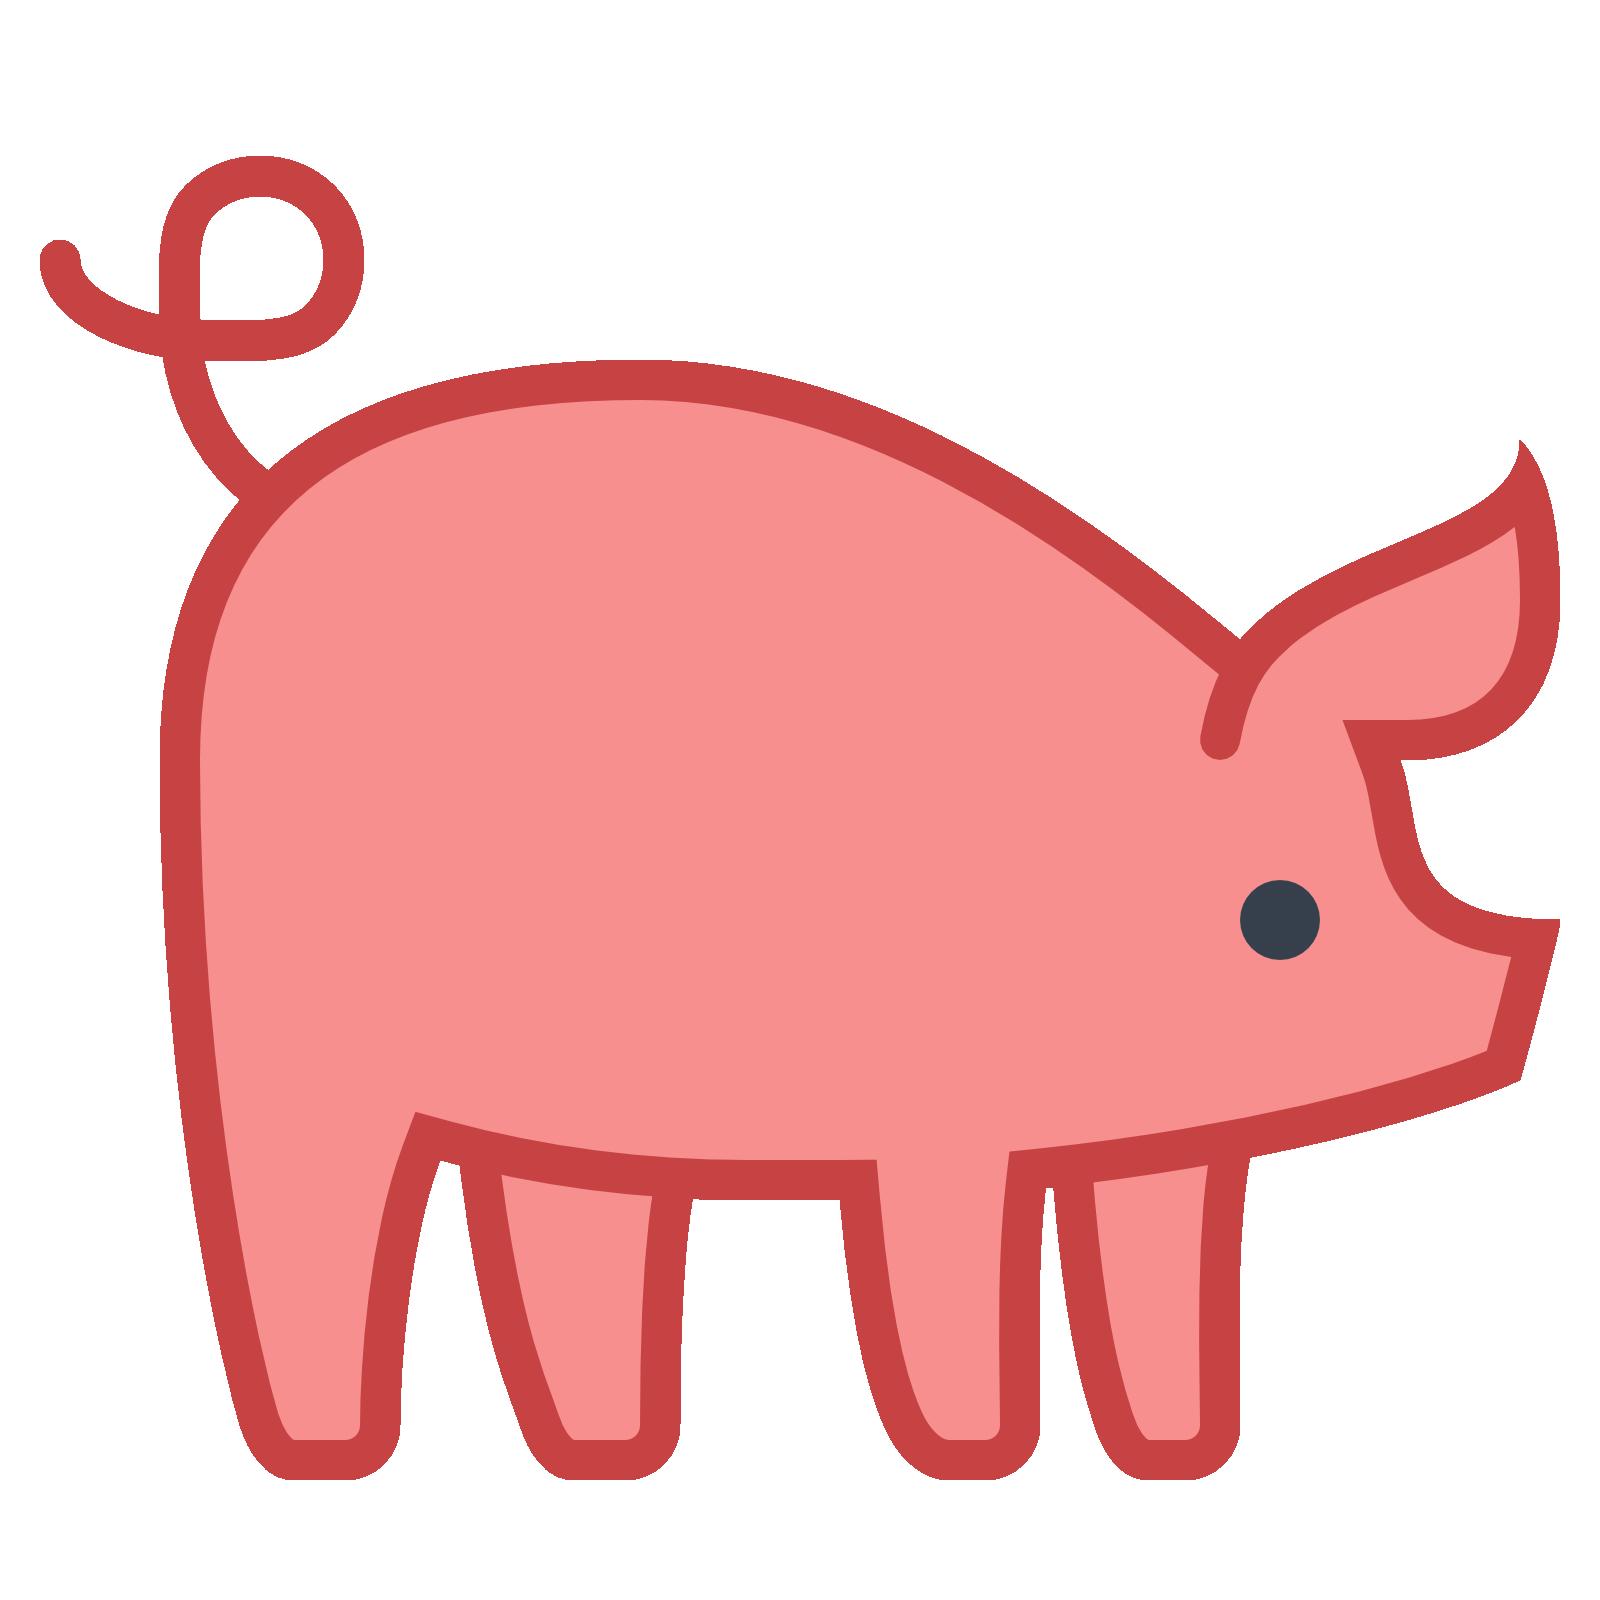 Clipart money pig. Image result for d